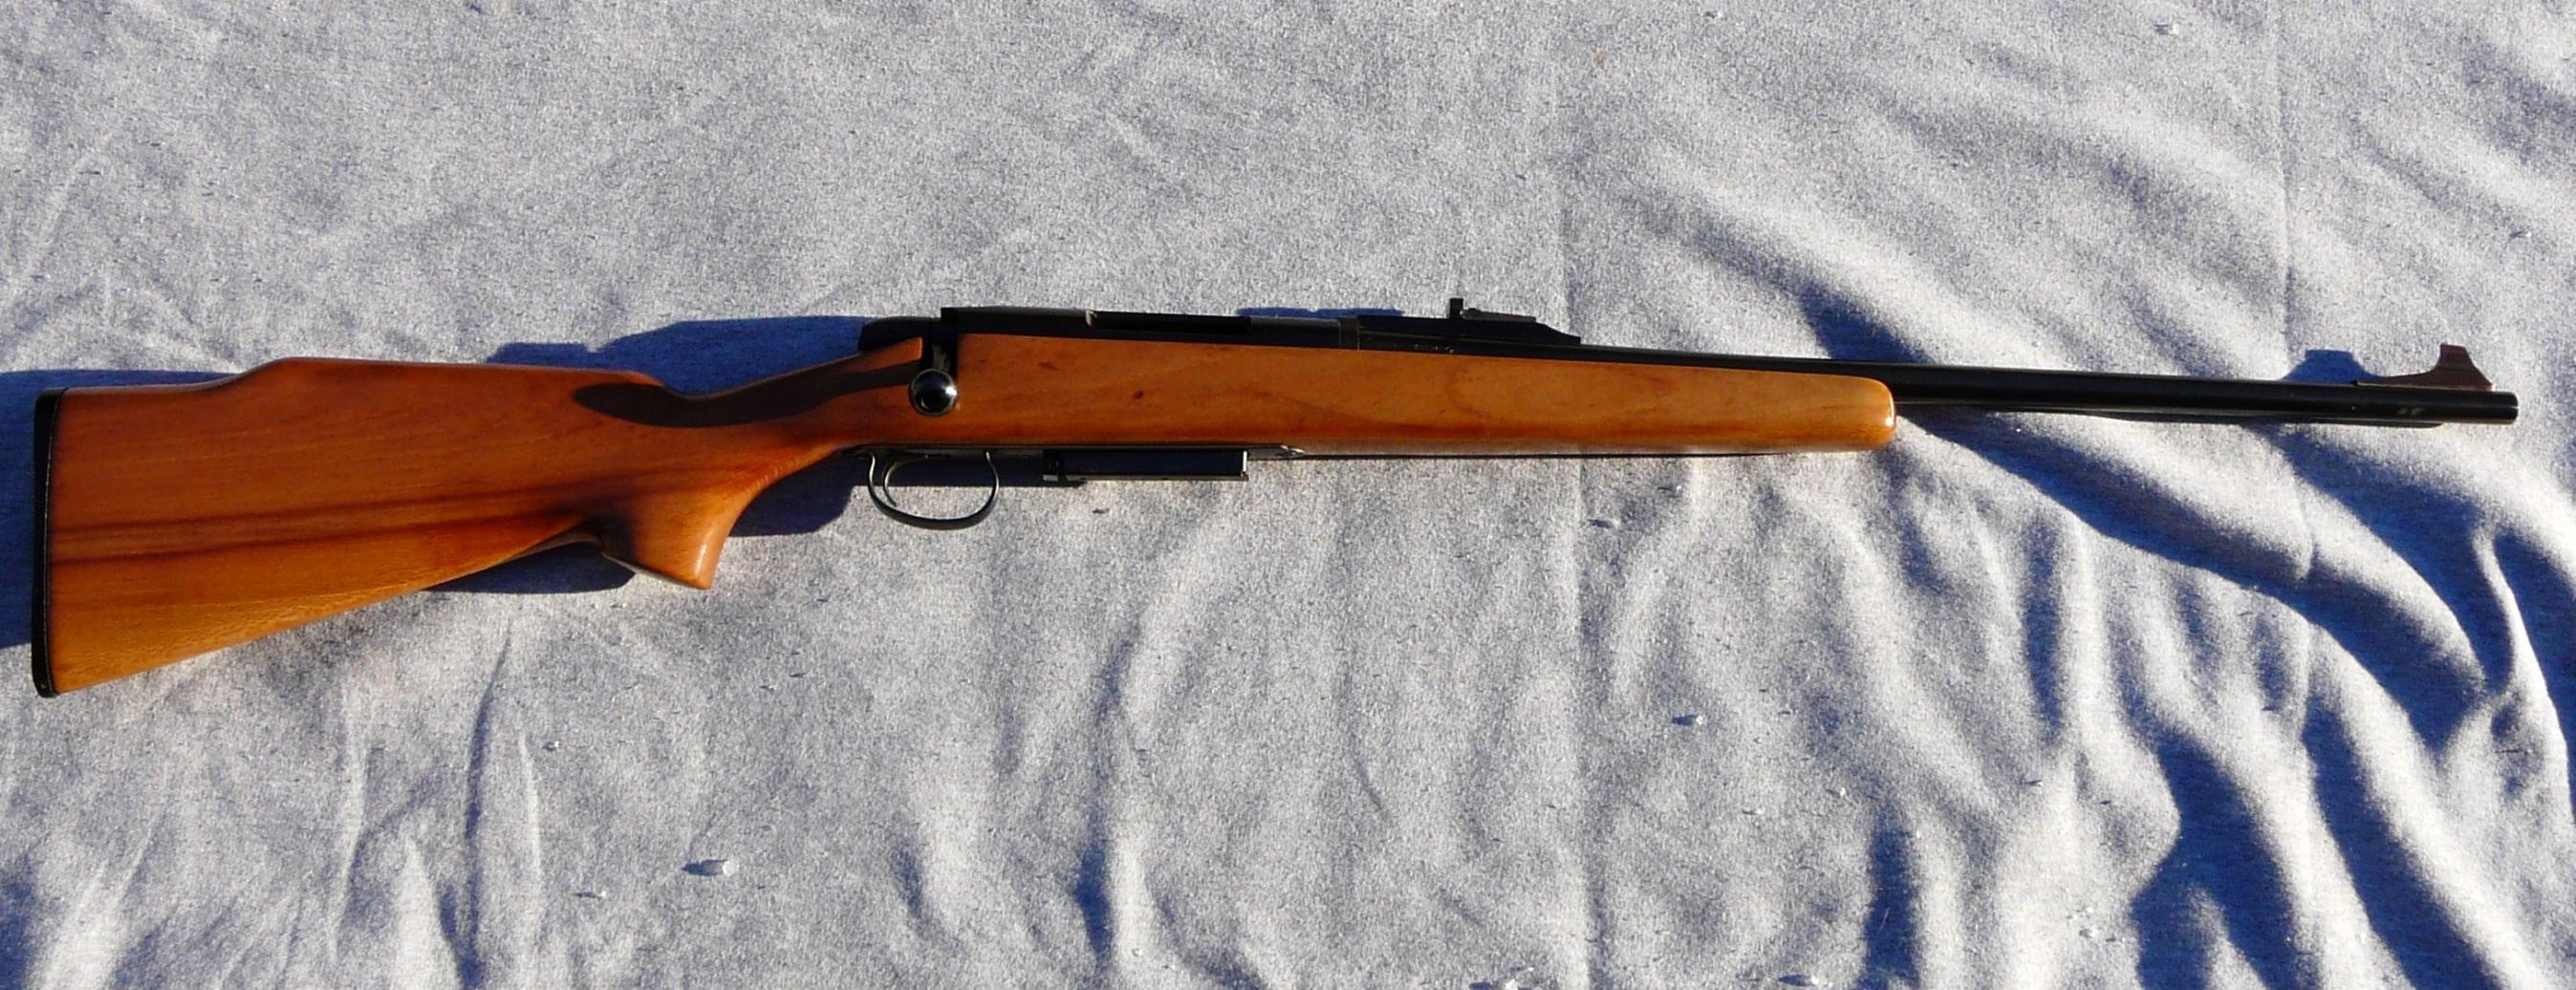 Remington 788-p1100921.jpg